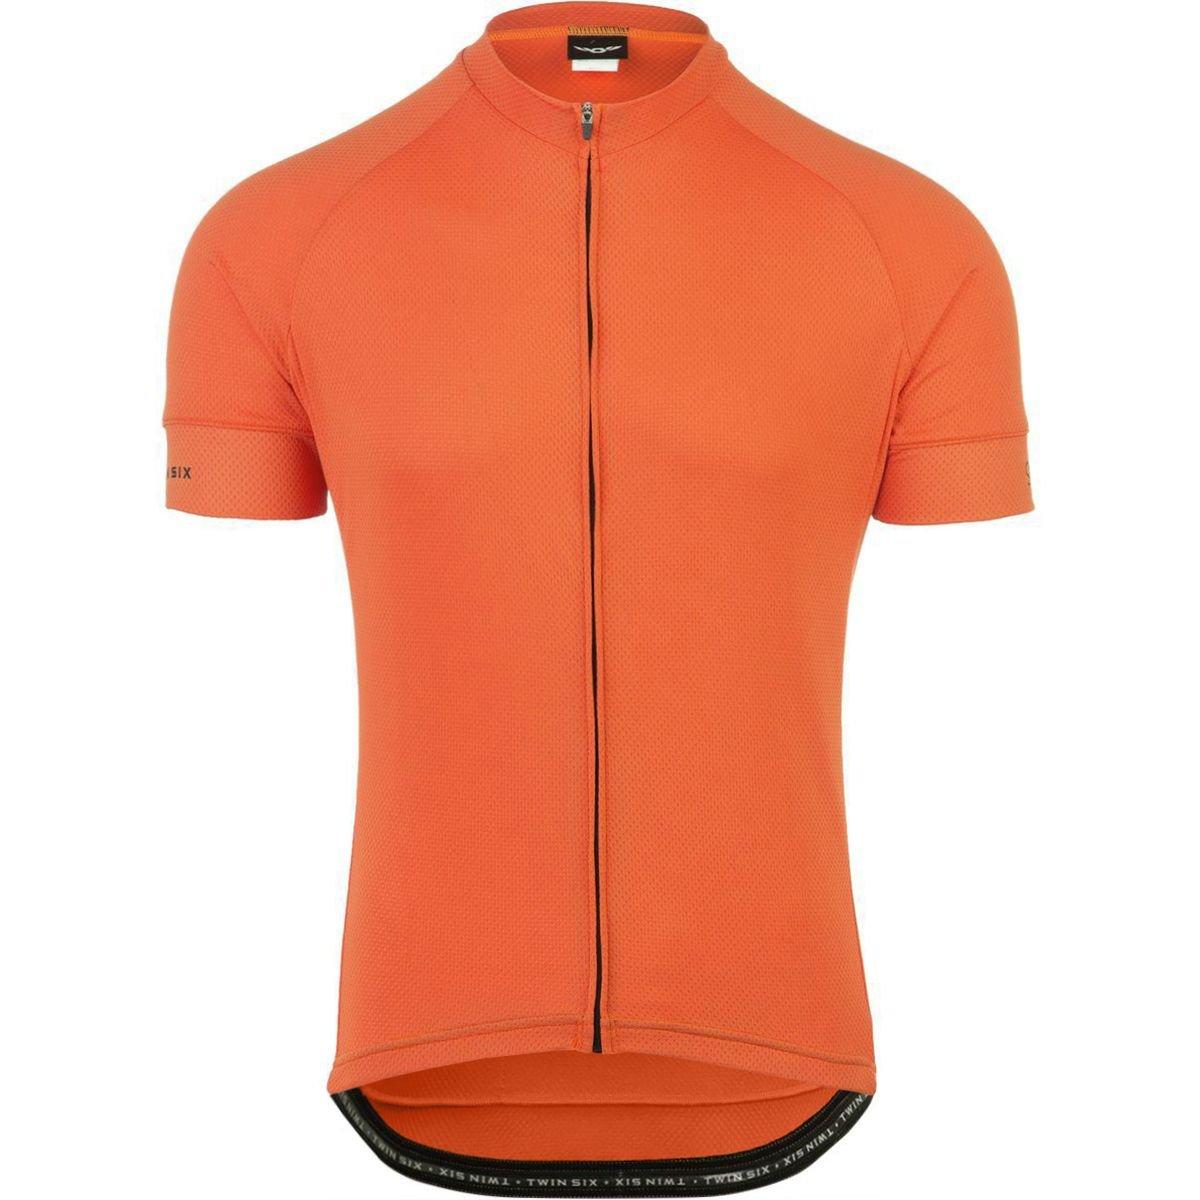 Twin Six Standard半袖Jersey – Men 's B0189VXWYW XL オレンジ オレンジ XL